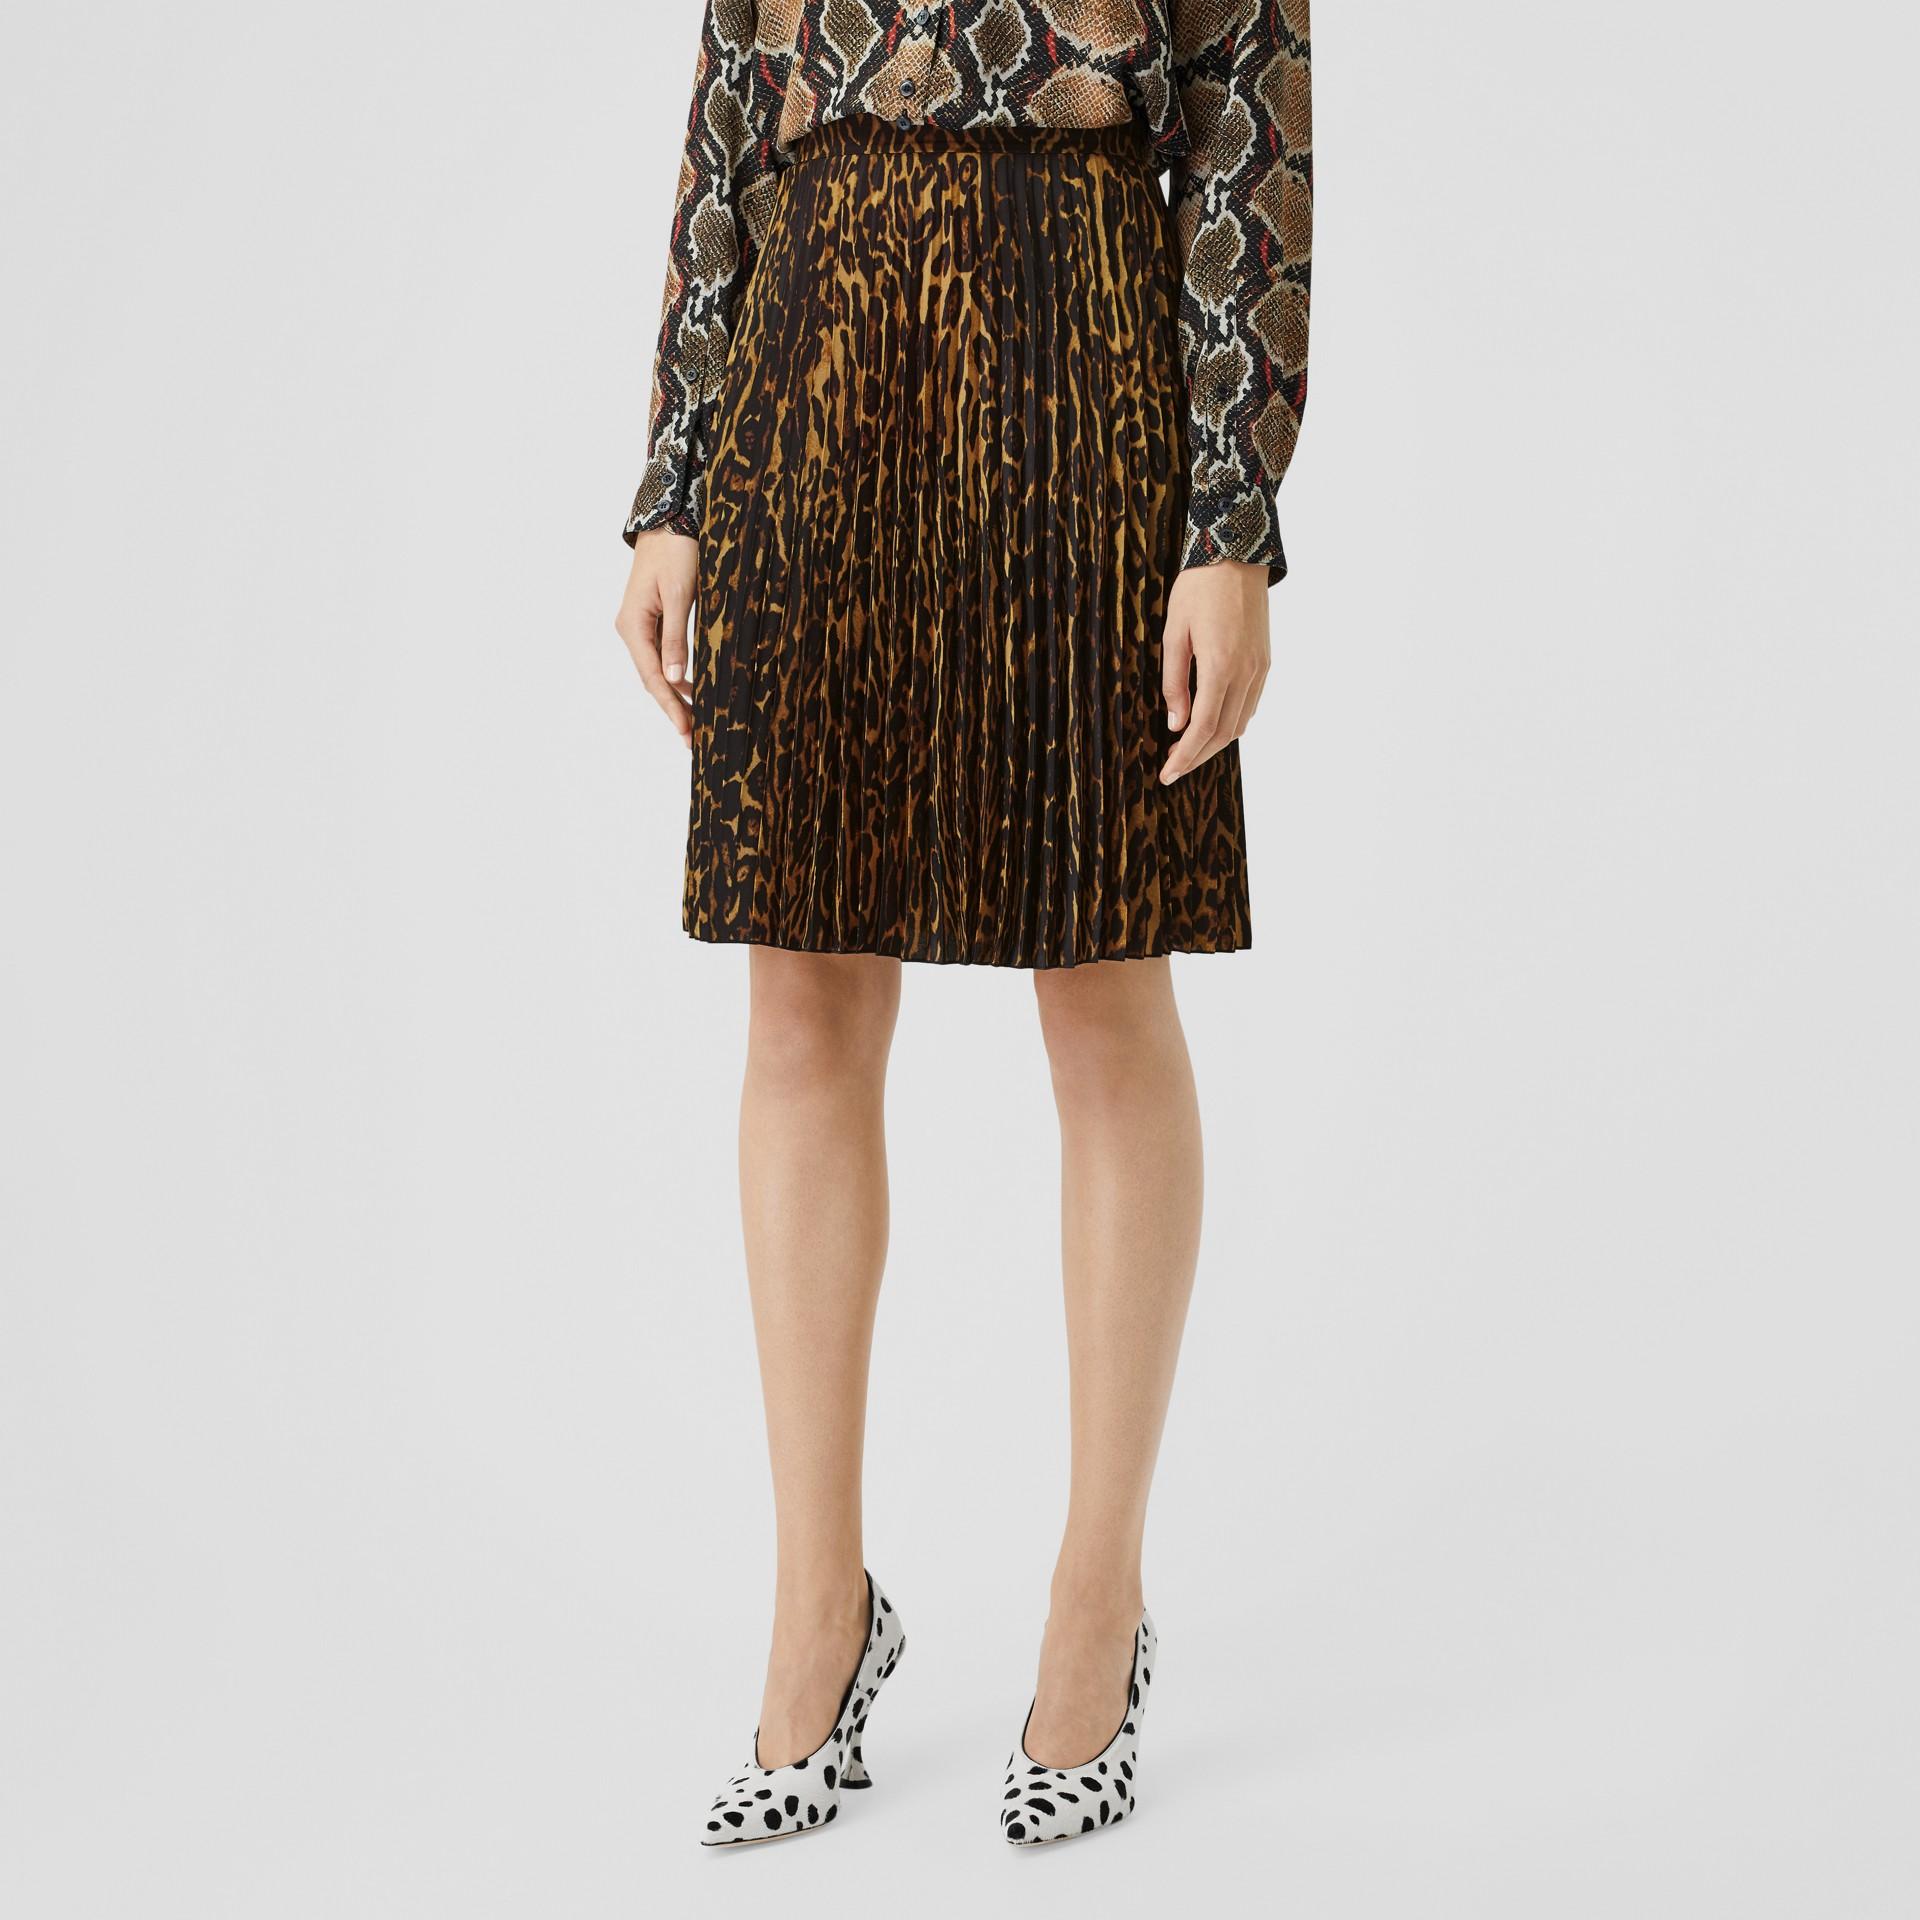 Leopard Print Pleated Skirt in Dark Mustard - Women | Burberry Hong Kong S.A.R - gallery image 4